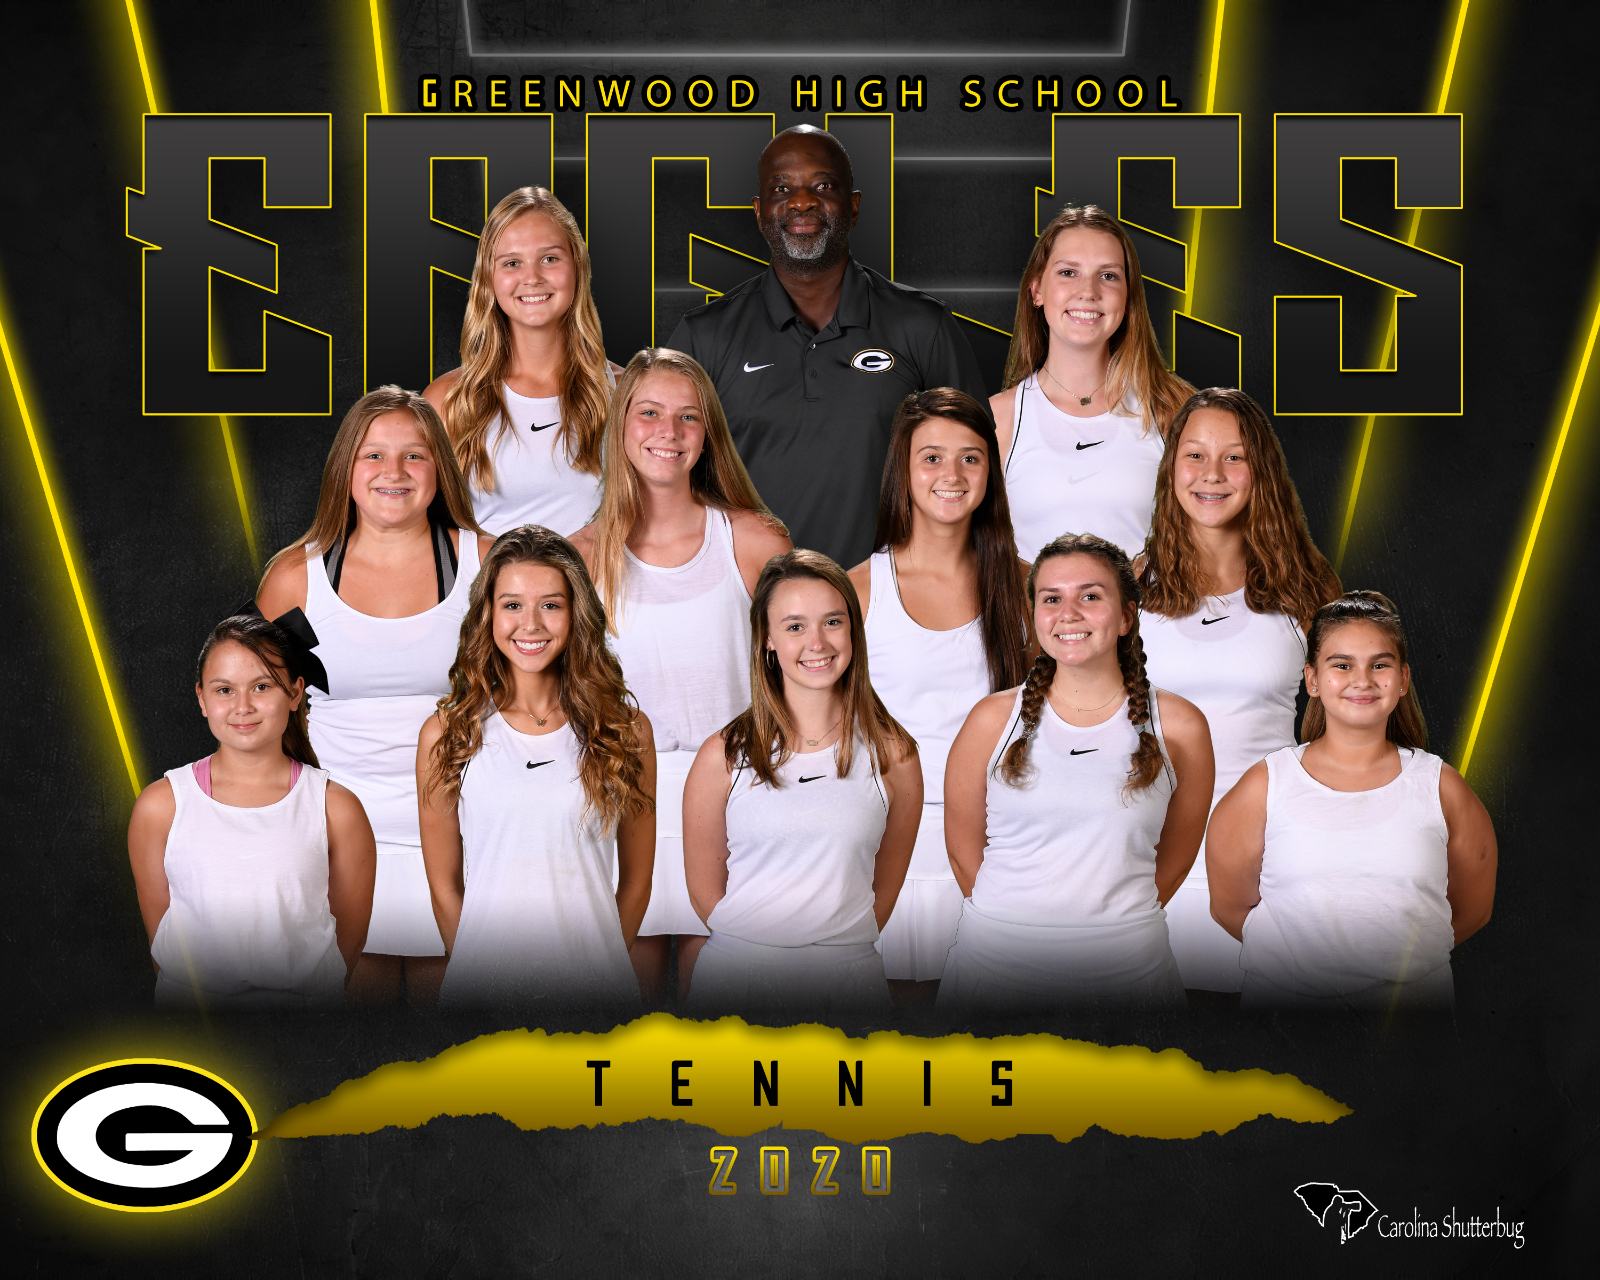 20-21 Girls Tennis Team Photo